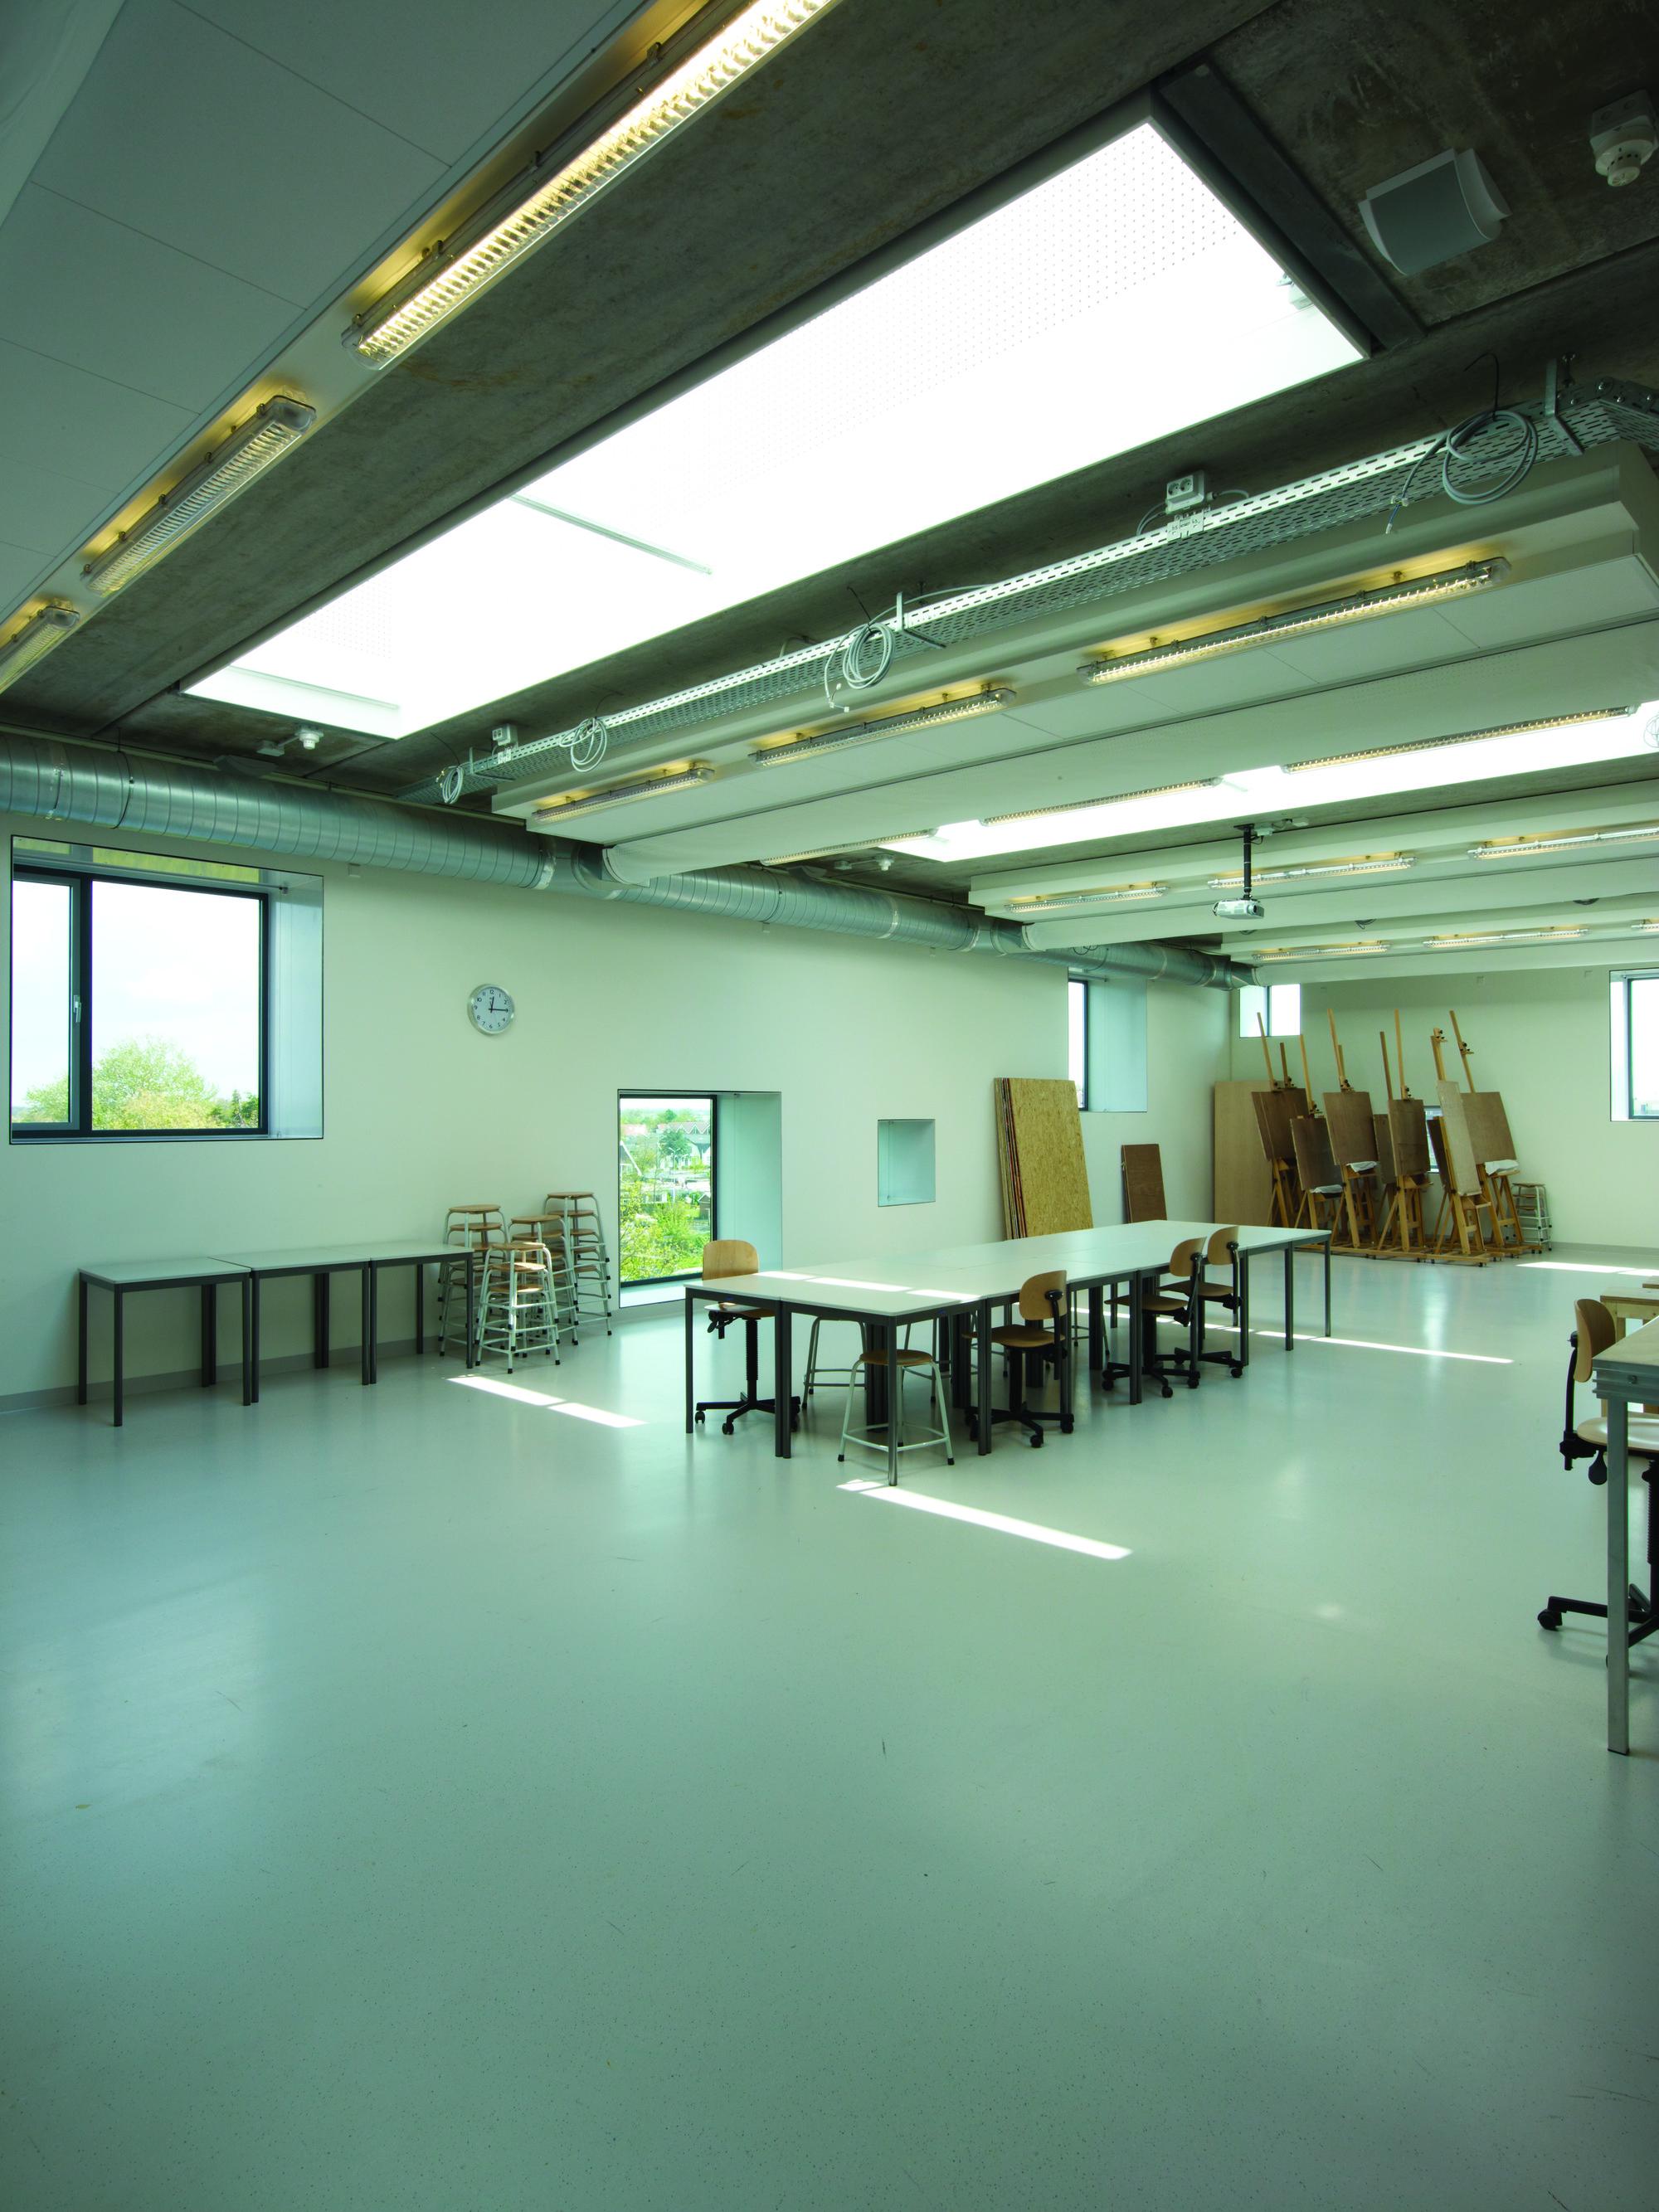 Pier K Theatre and Arts Centre / Ector Hoogstad Architecten